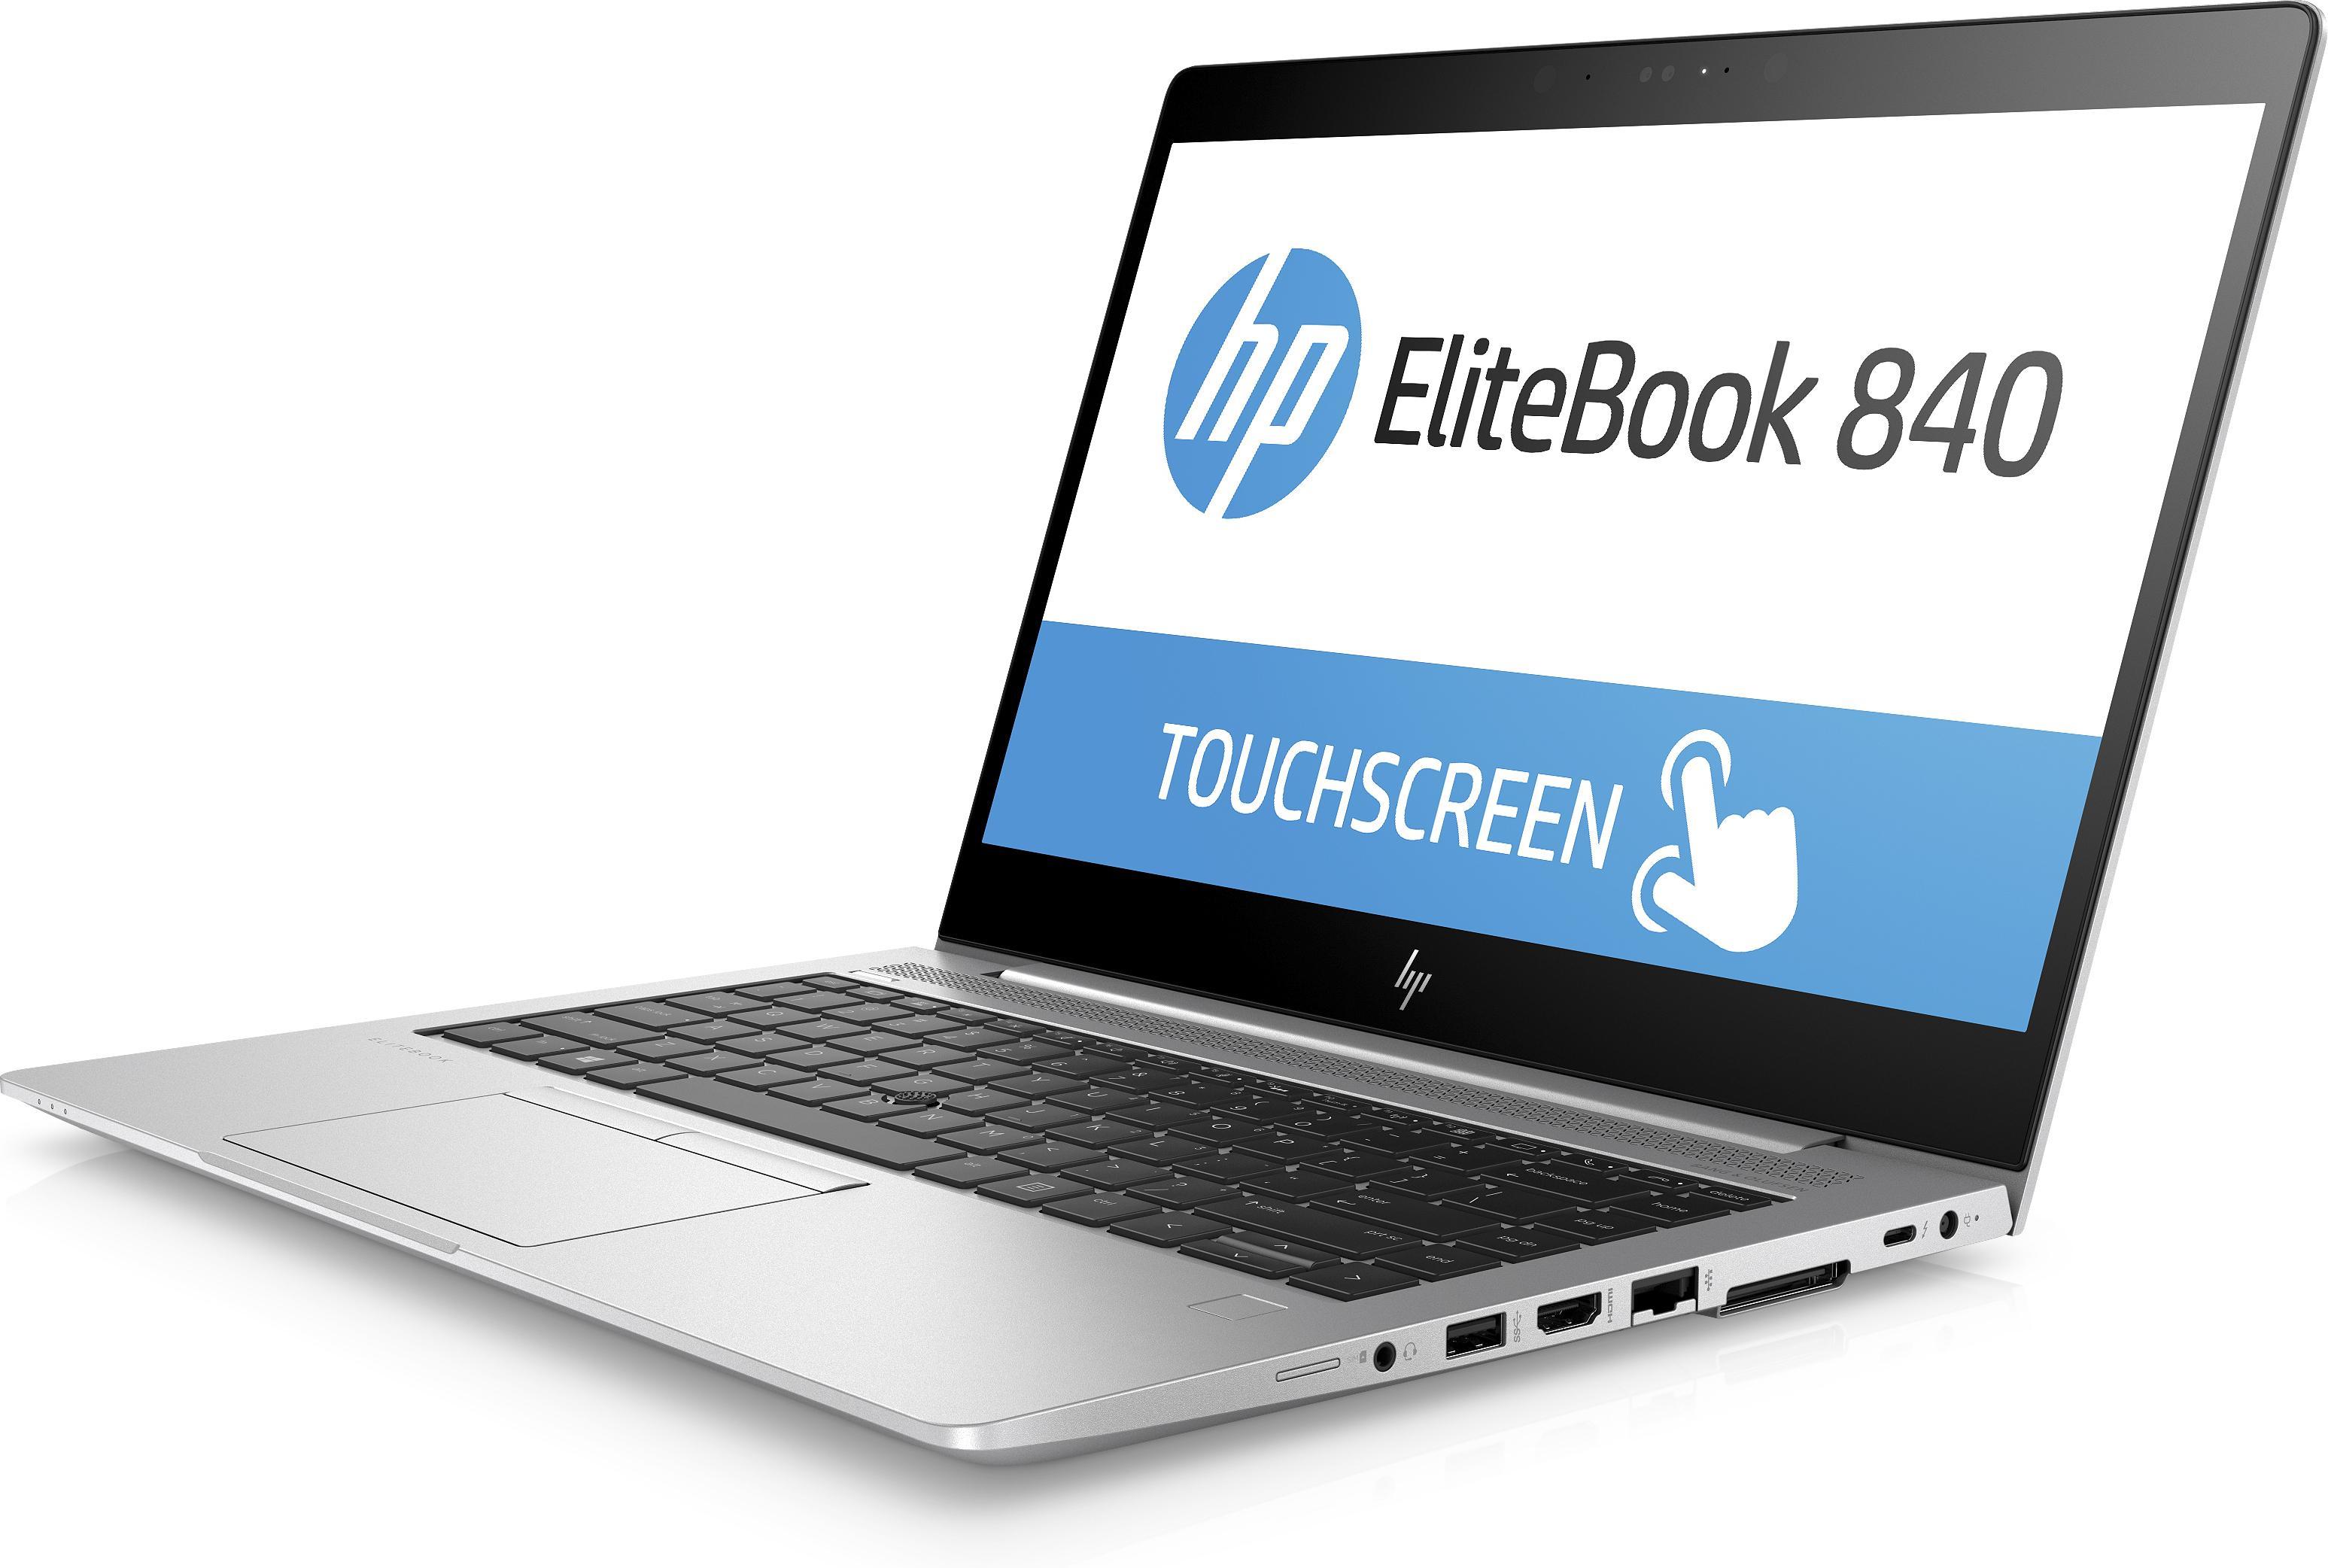 HP ELITEBOOK 840,i5, 8GB, 256SSD